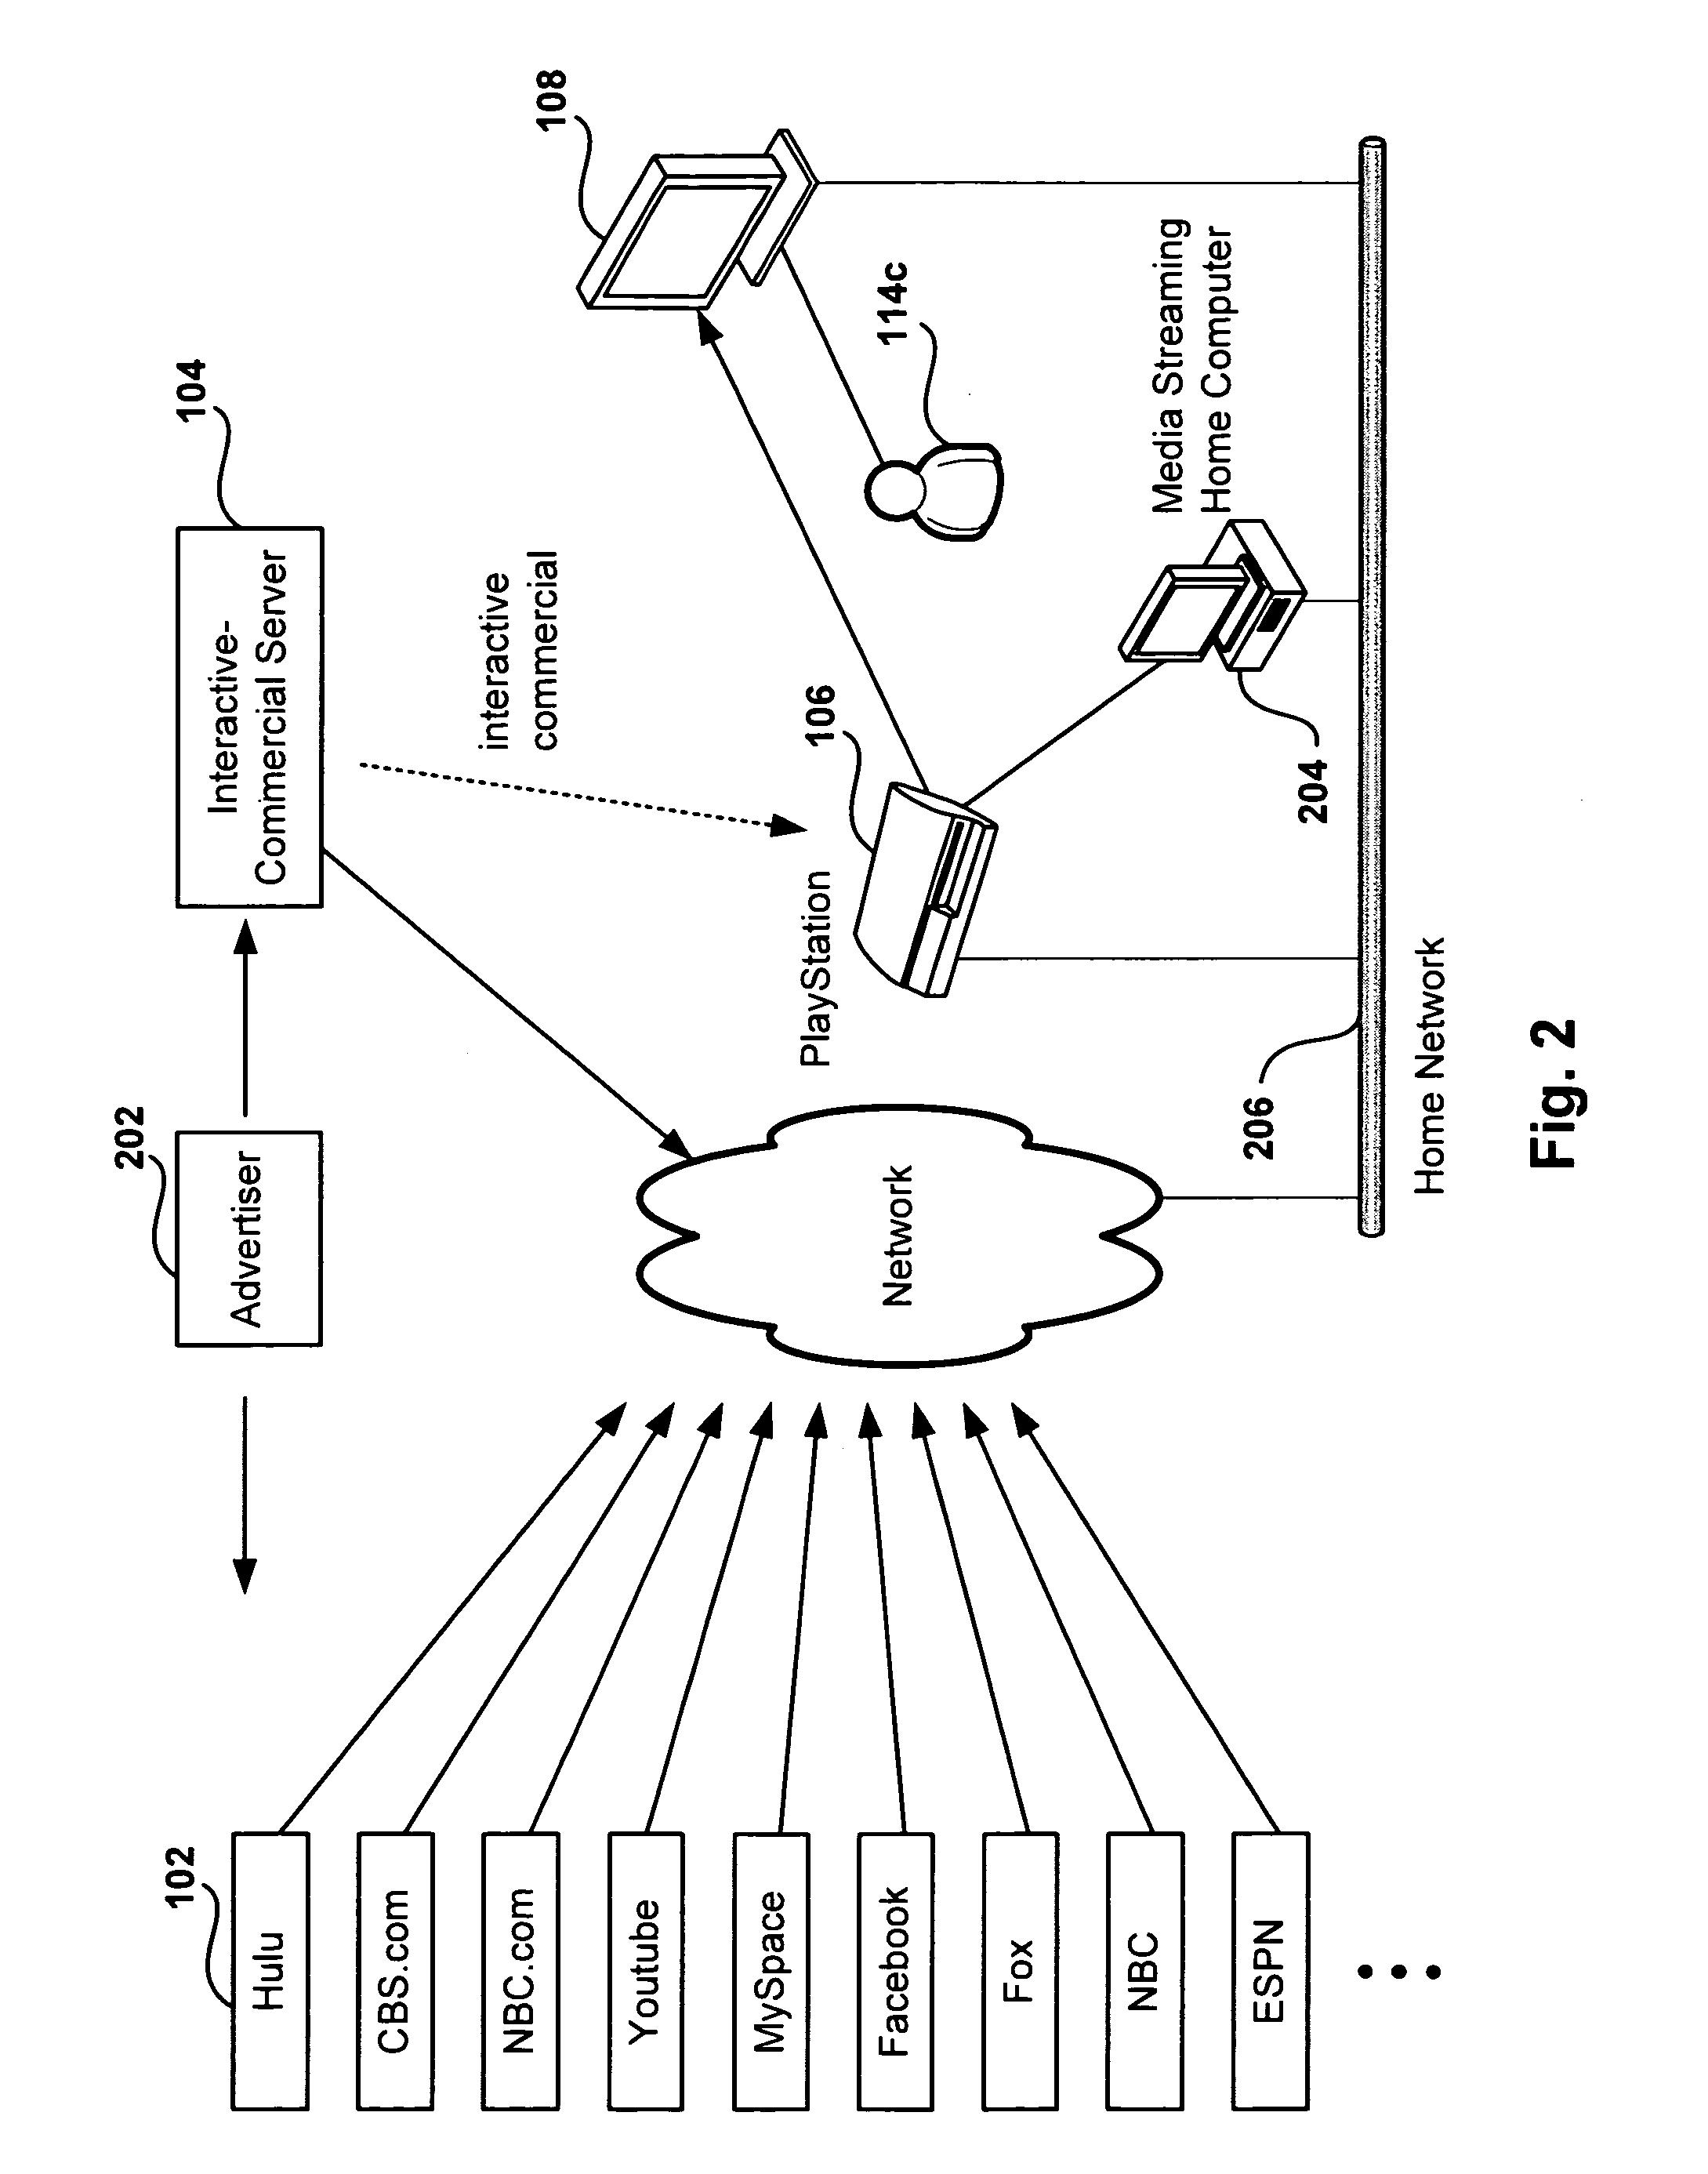 Directv Hr34 Wiring Diagram, Directv, Get Free Image About